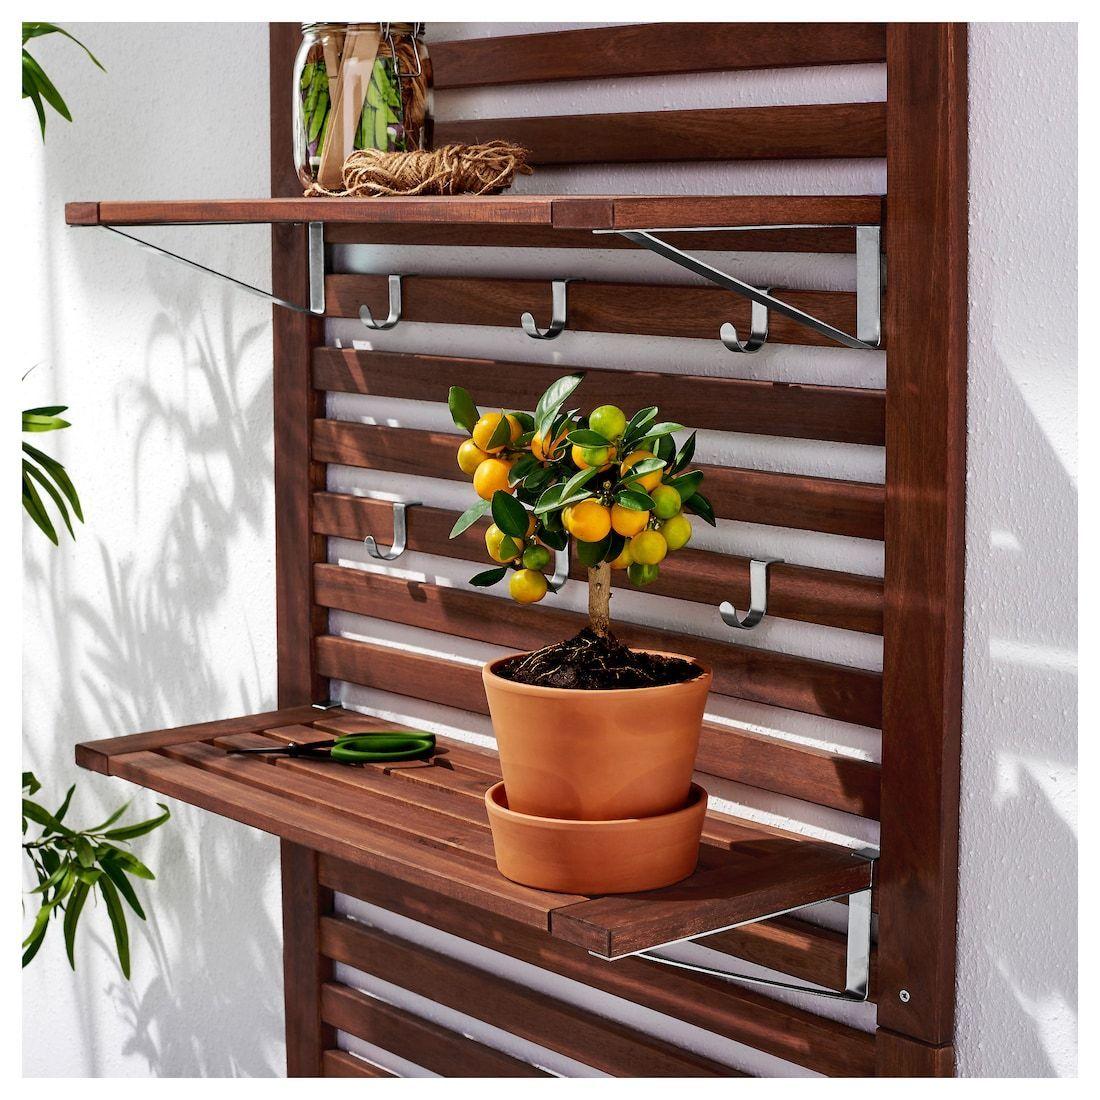 Applaro Wall Panel 2 Shelves Outdoor Brown Stained Brown 31 1 2x11 3 4x62 1 4 Wall Paneling Outdoor Shelves Interior Wood Trim